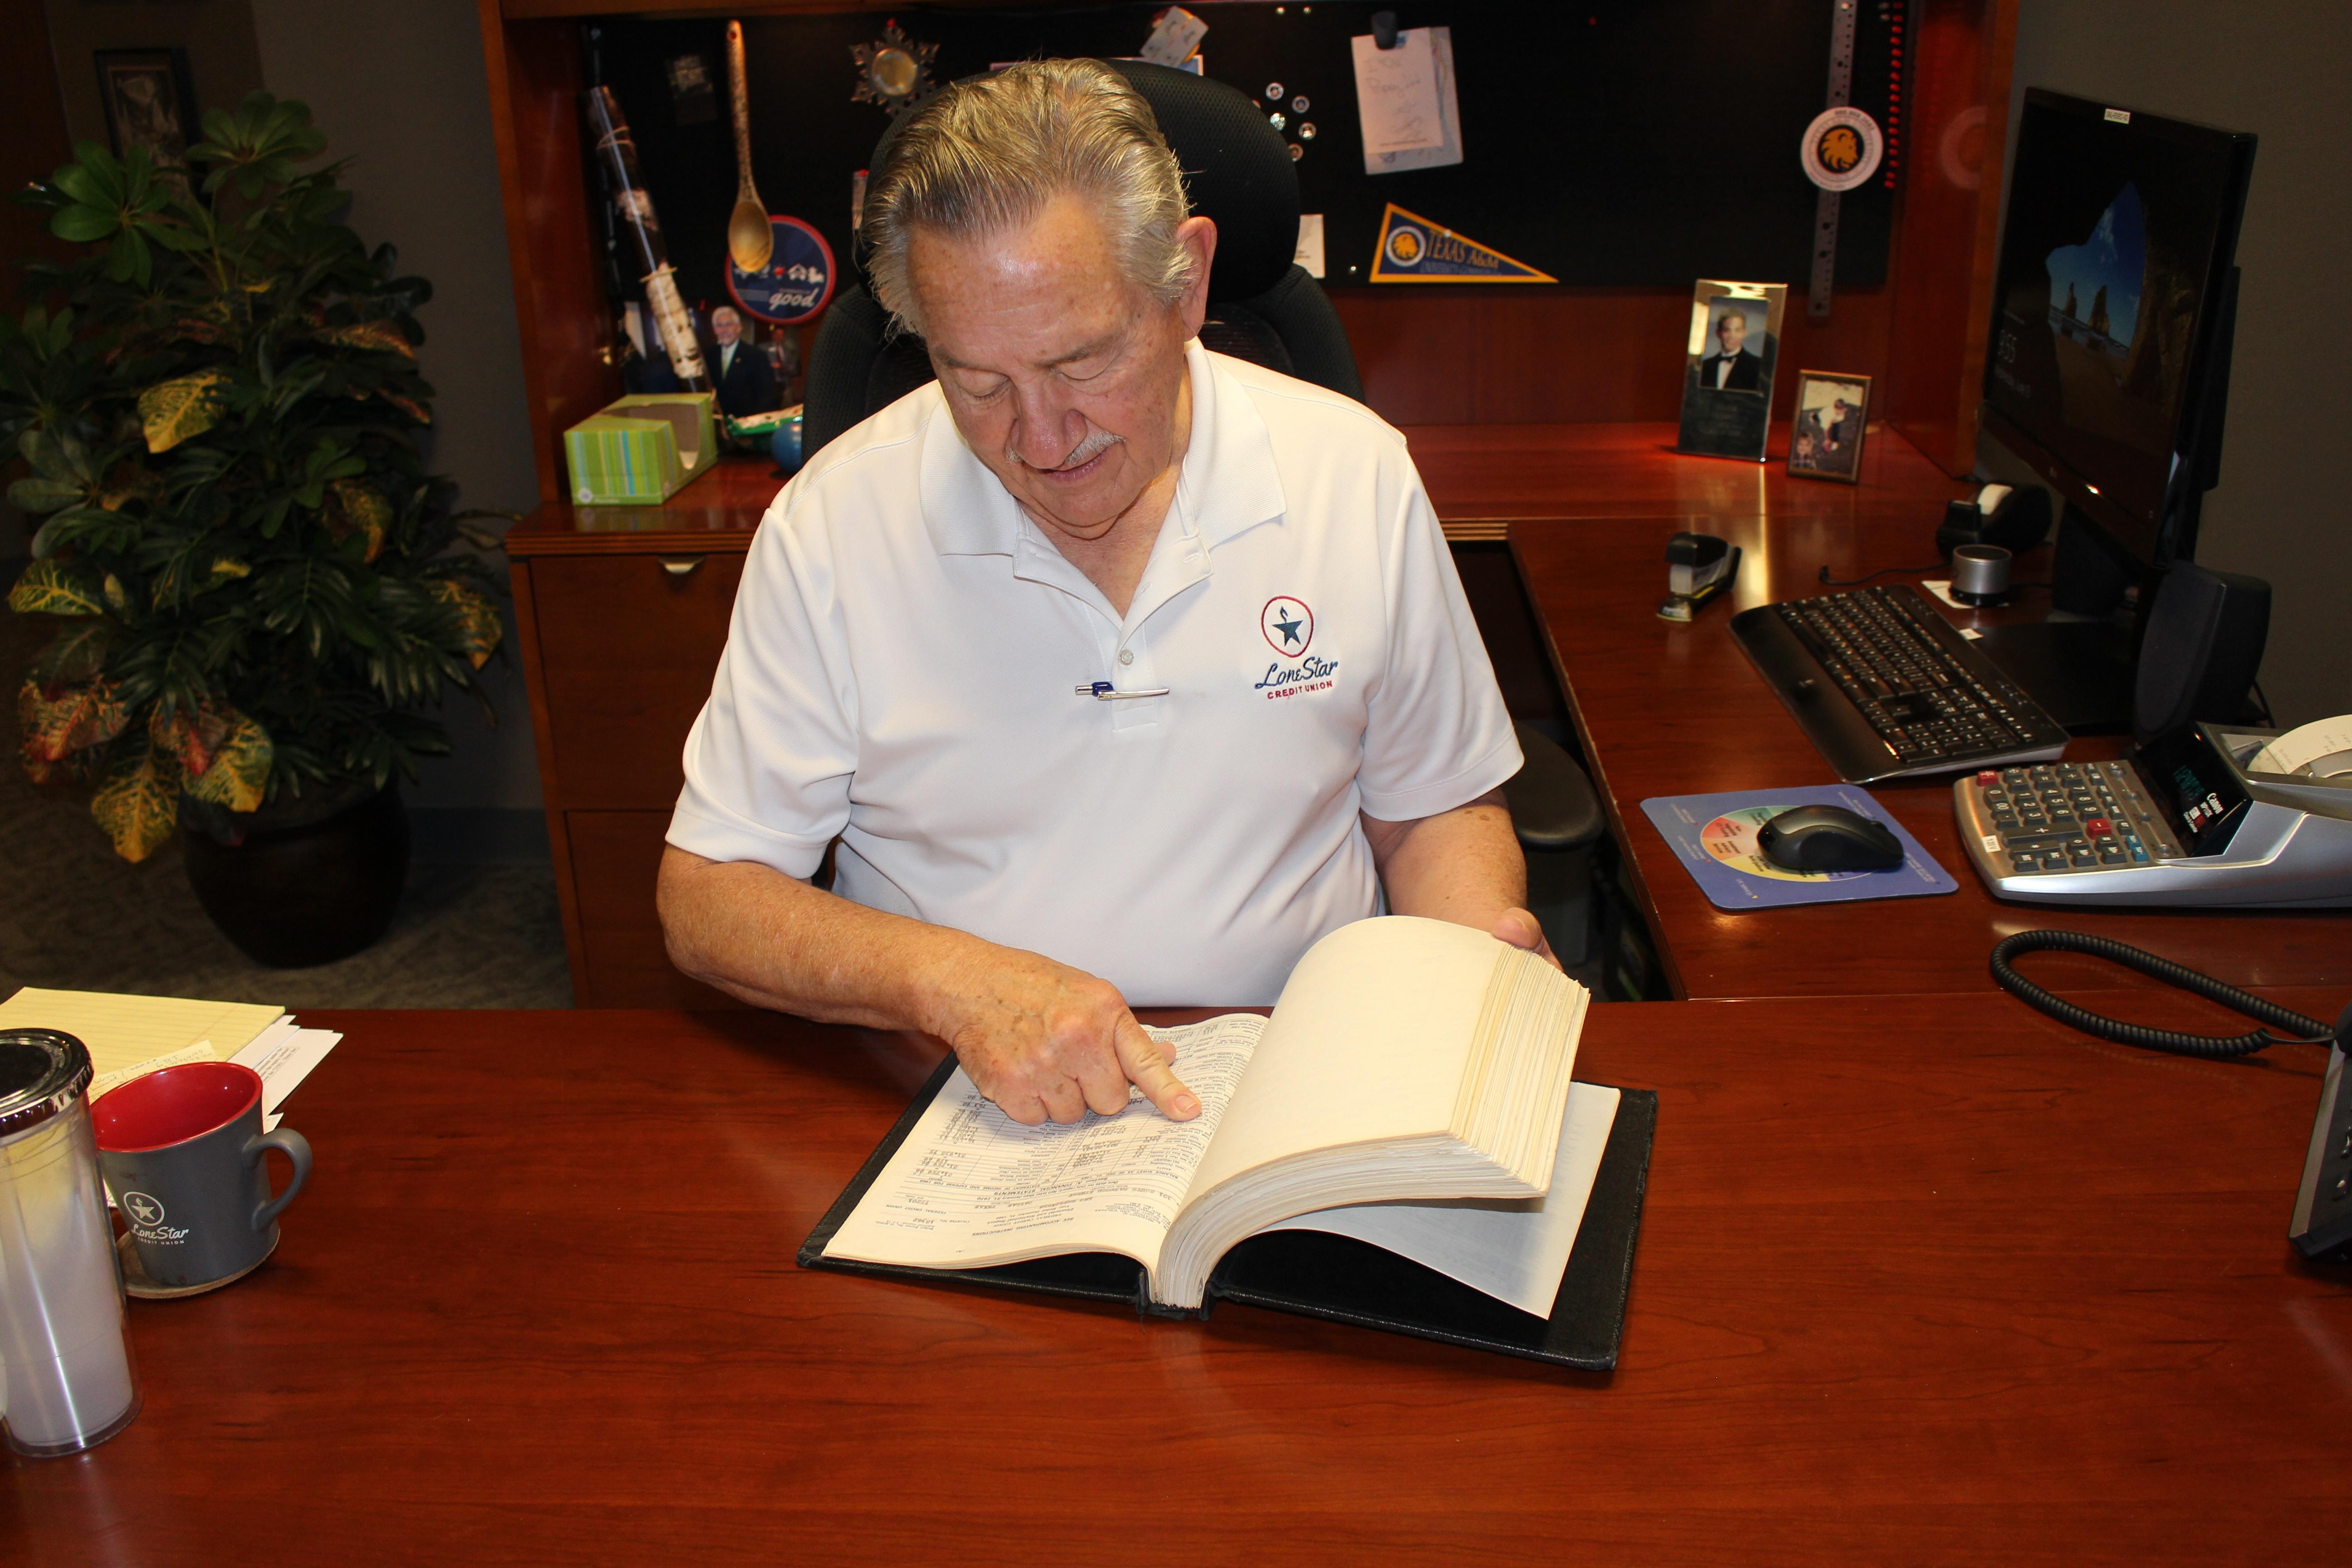 Man reading a book at a desk